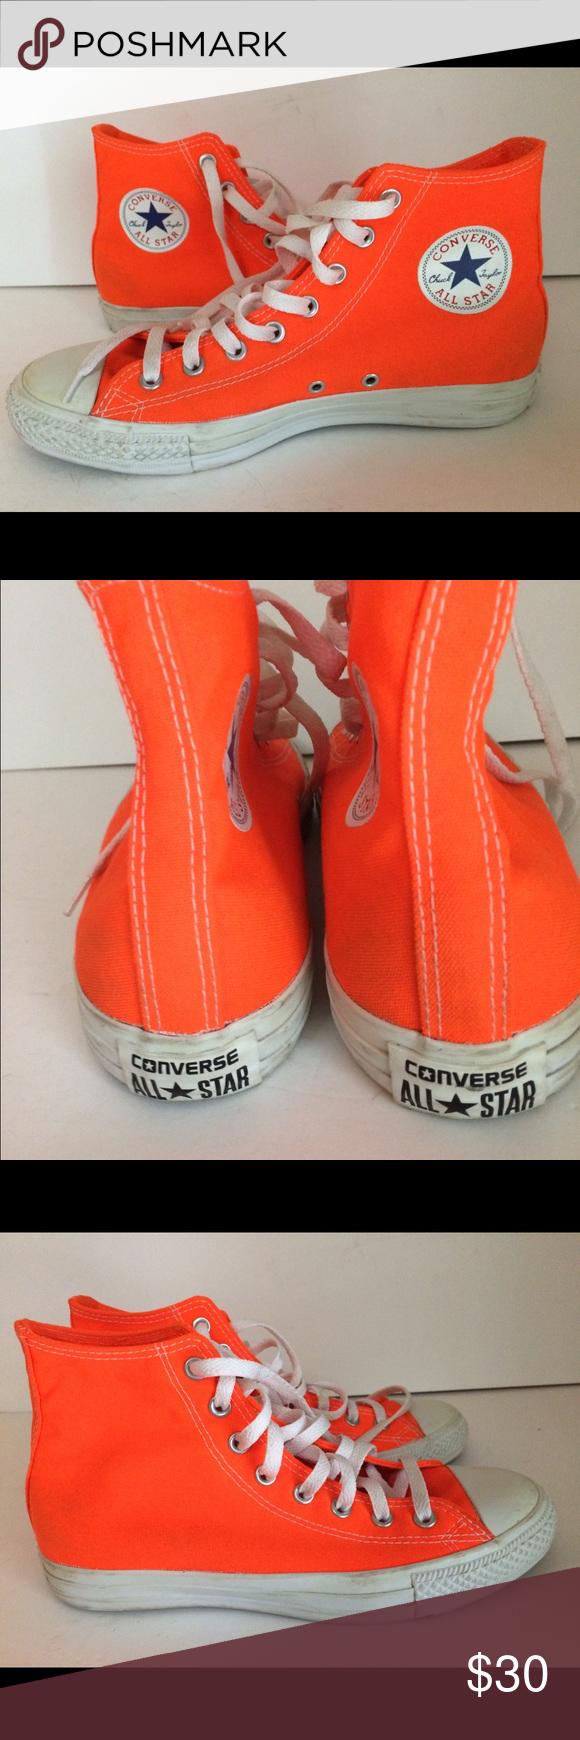 79df2def376c Converse All Chuck Taylor Neon Orange Converse All Star Chuck Taylor Neon  Orange High Top Sneakers Size 10 Medium. Very good condition - no flaws -  light ...